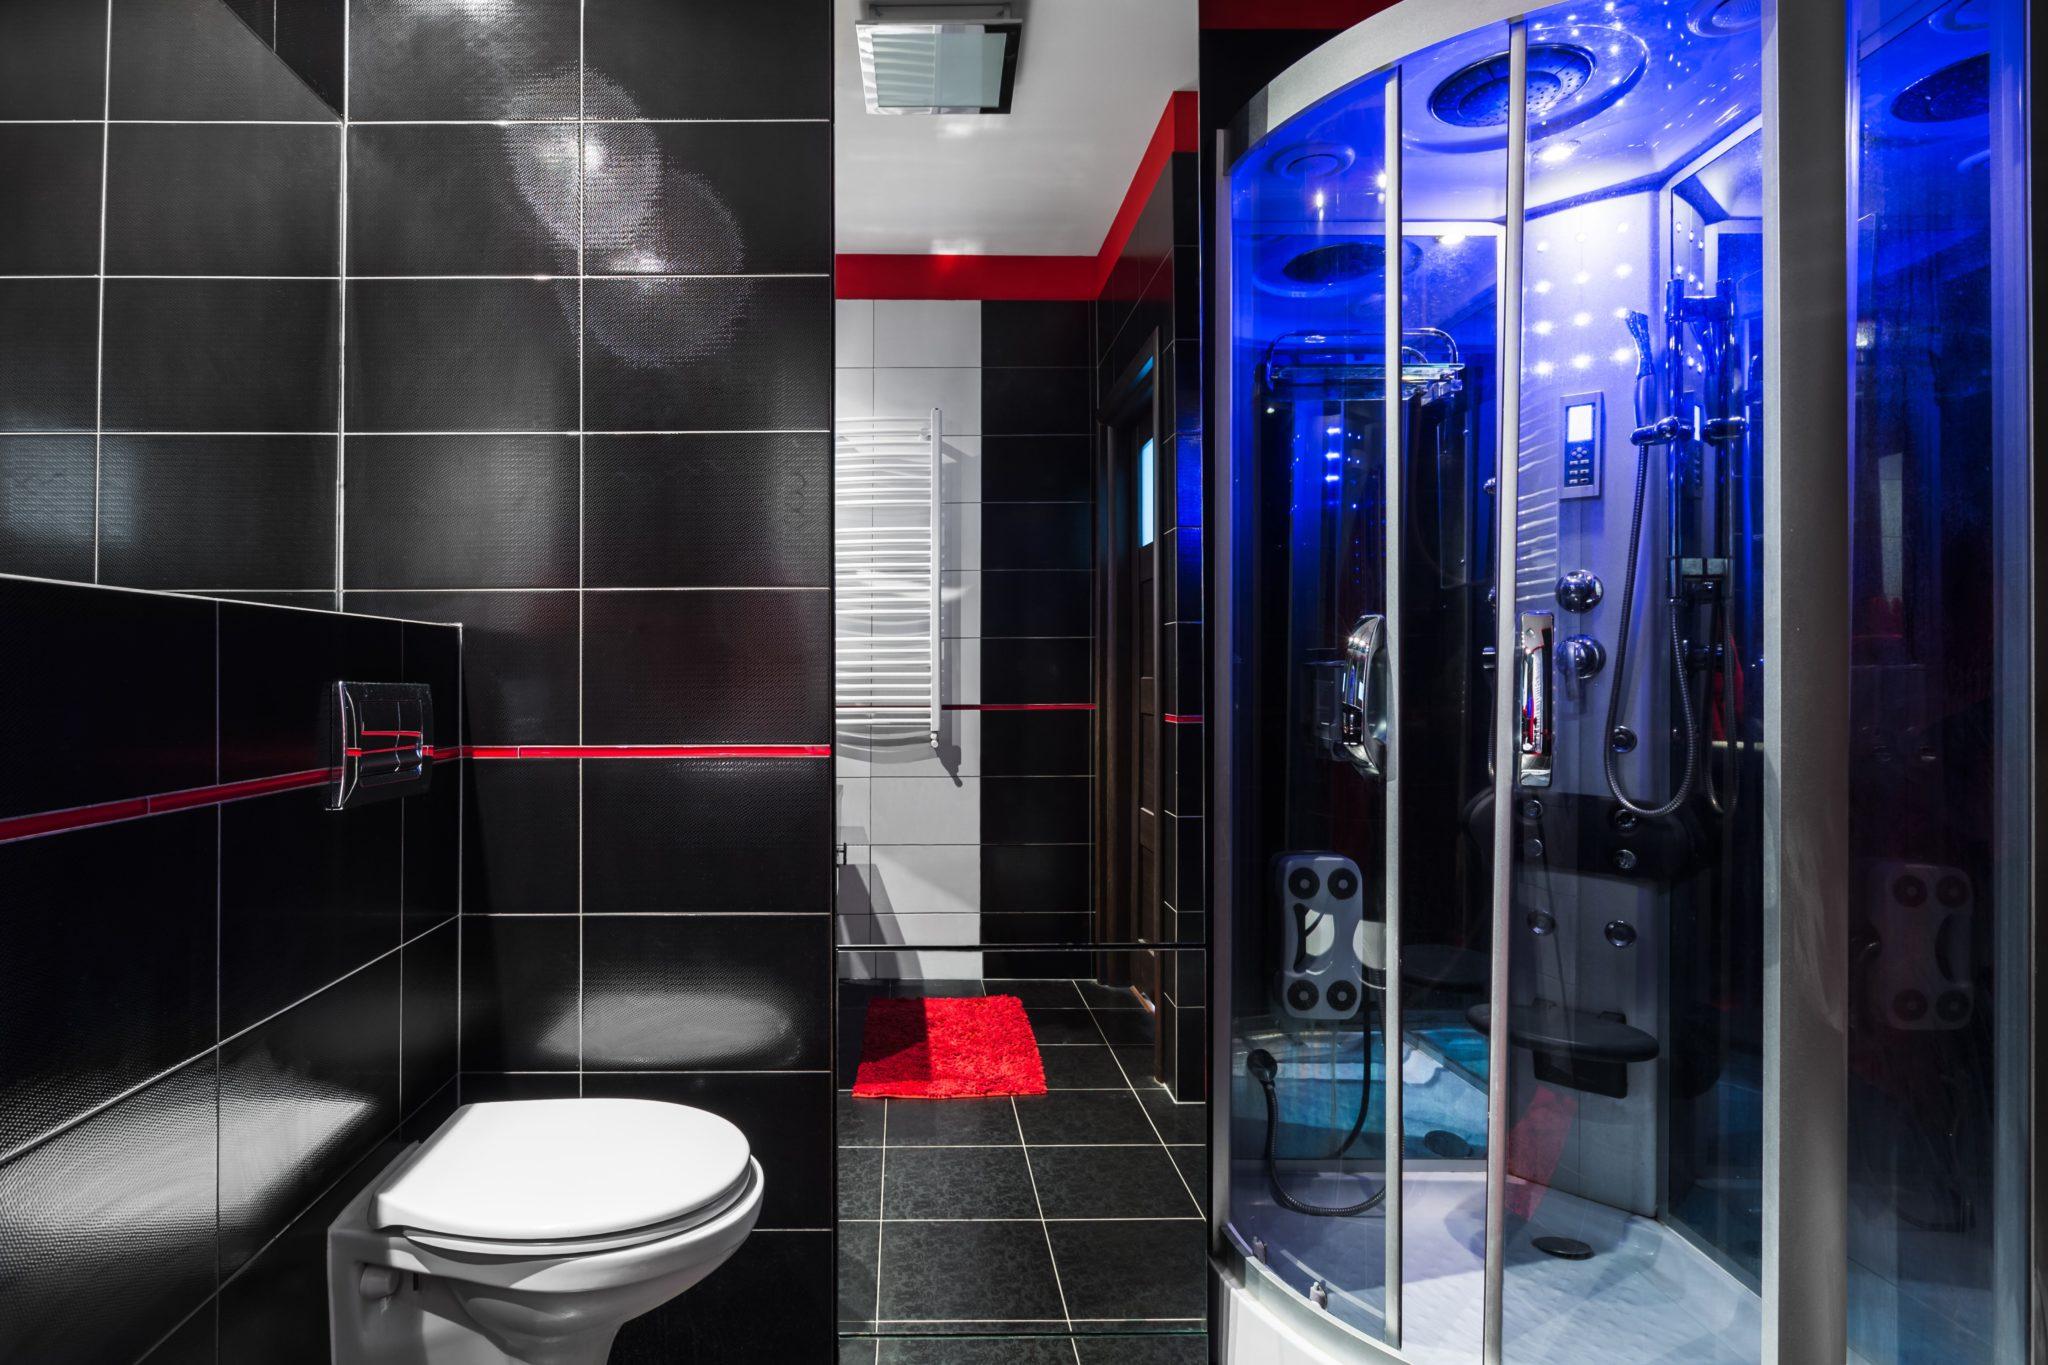 High Tech Bathroom High Tech Bathroom Upgrades The Money Pit